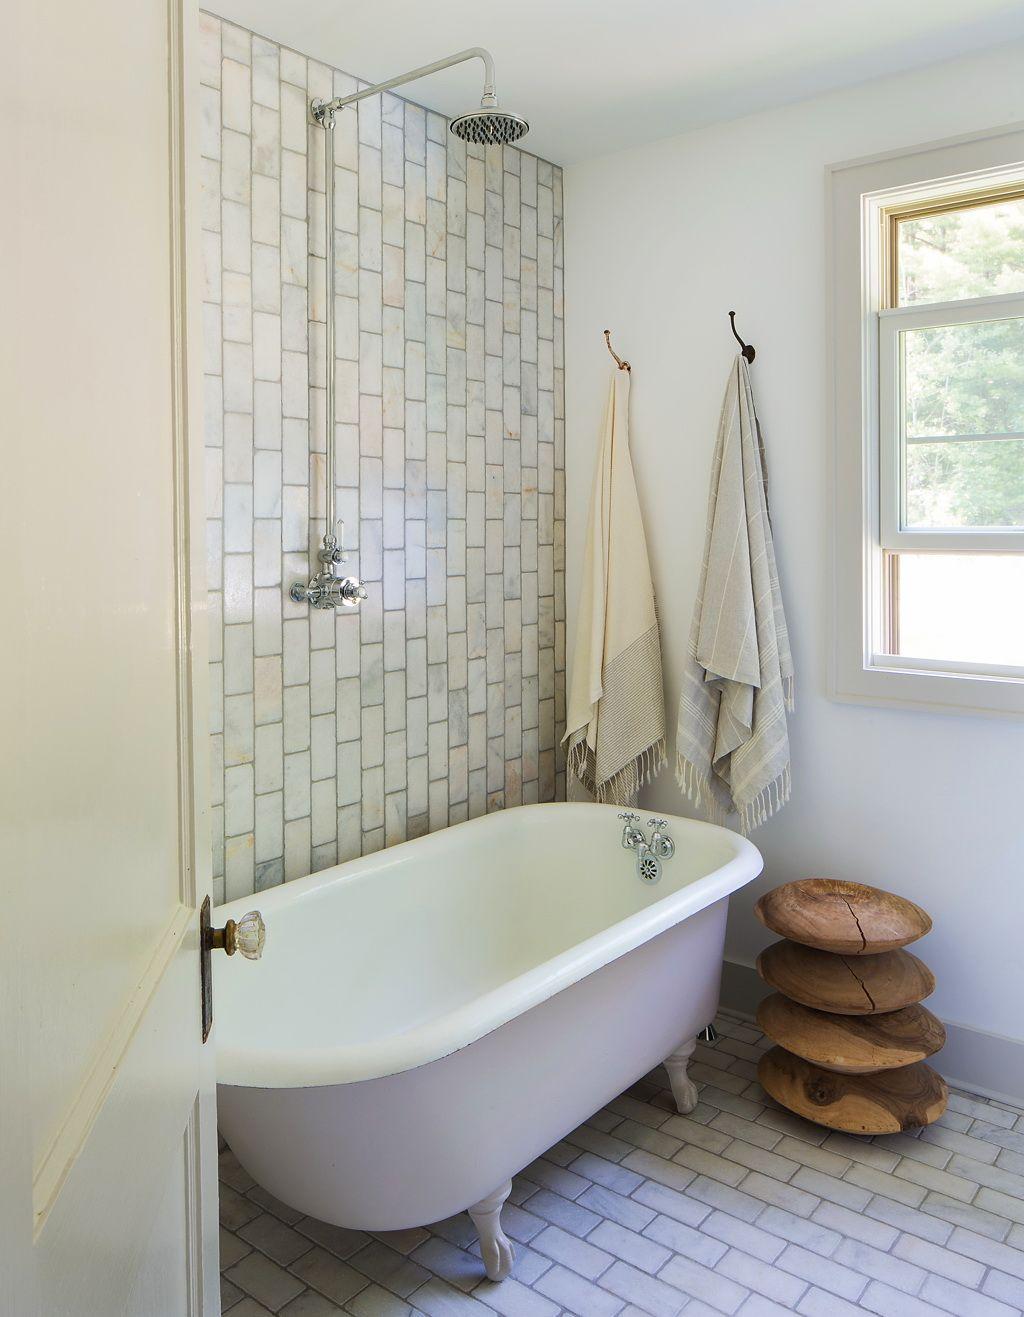 Remodelista-9   Bathroom   Pinterest   Nest, Interiors and House